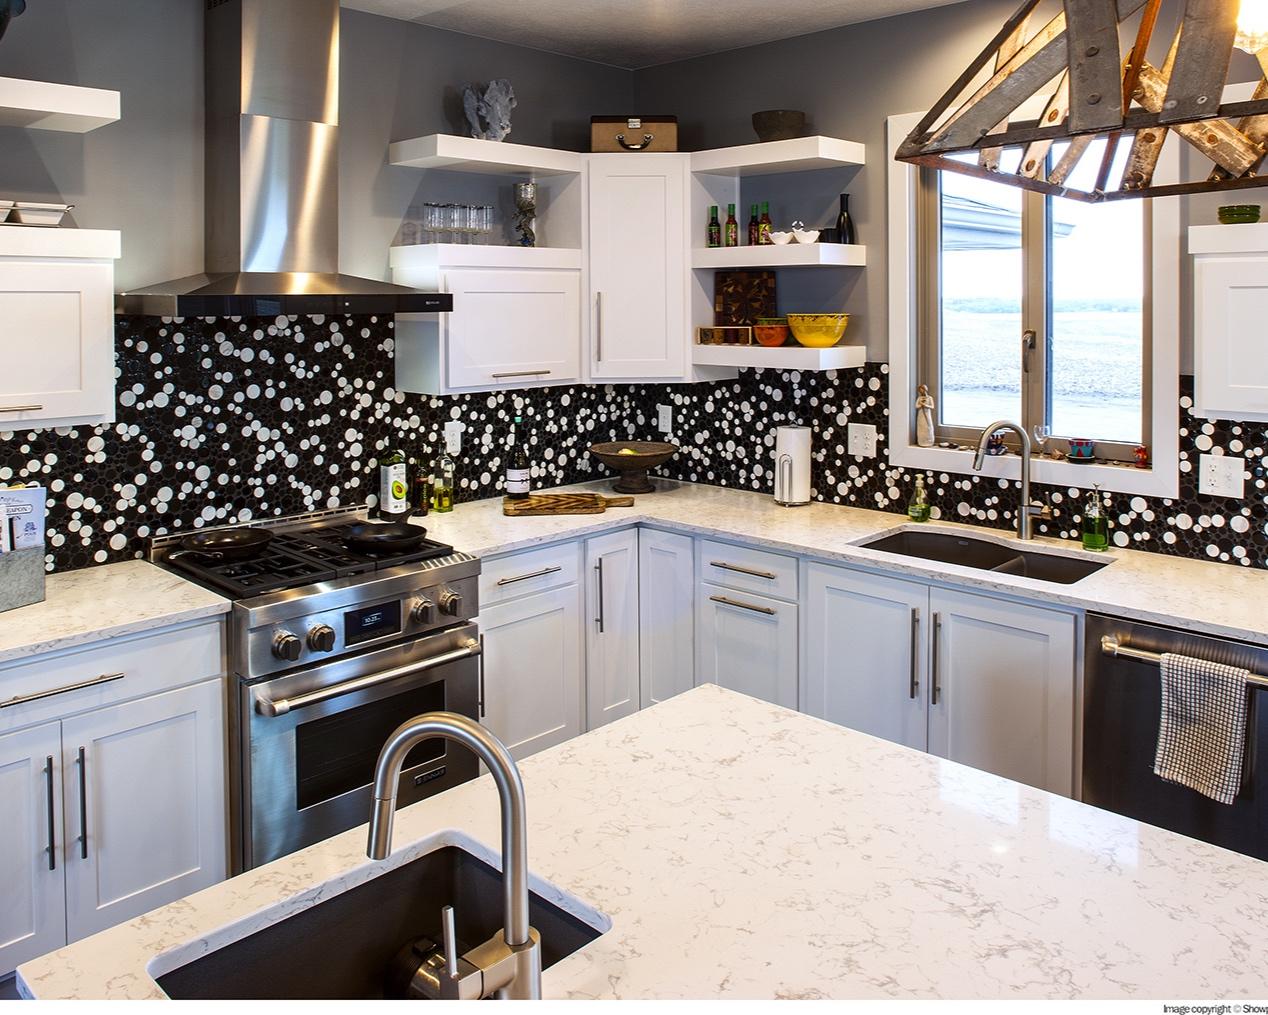 House of Kitchens - kitchen design.jpg